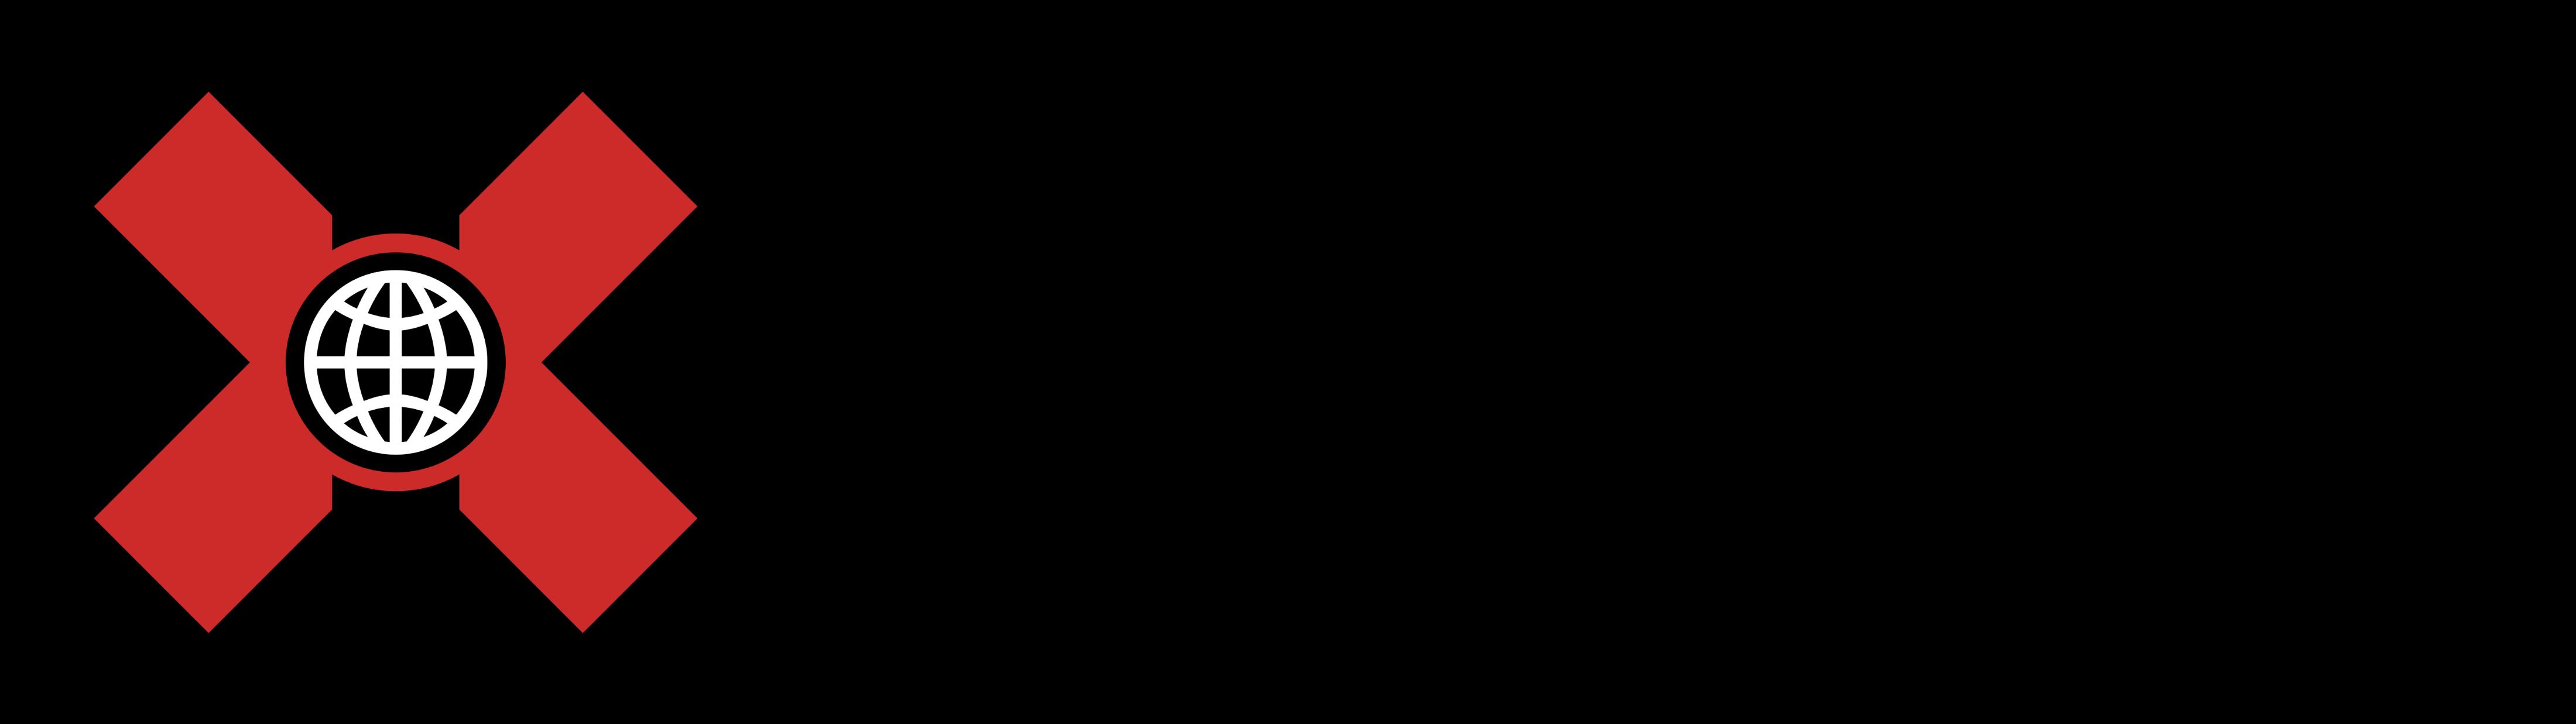 2c8b273f-7725-48ab-85ef-bb3962082c8c.png